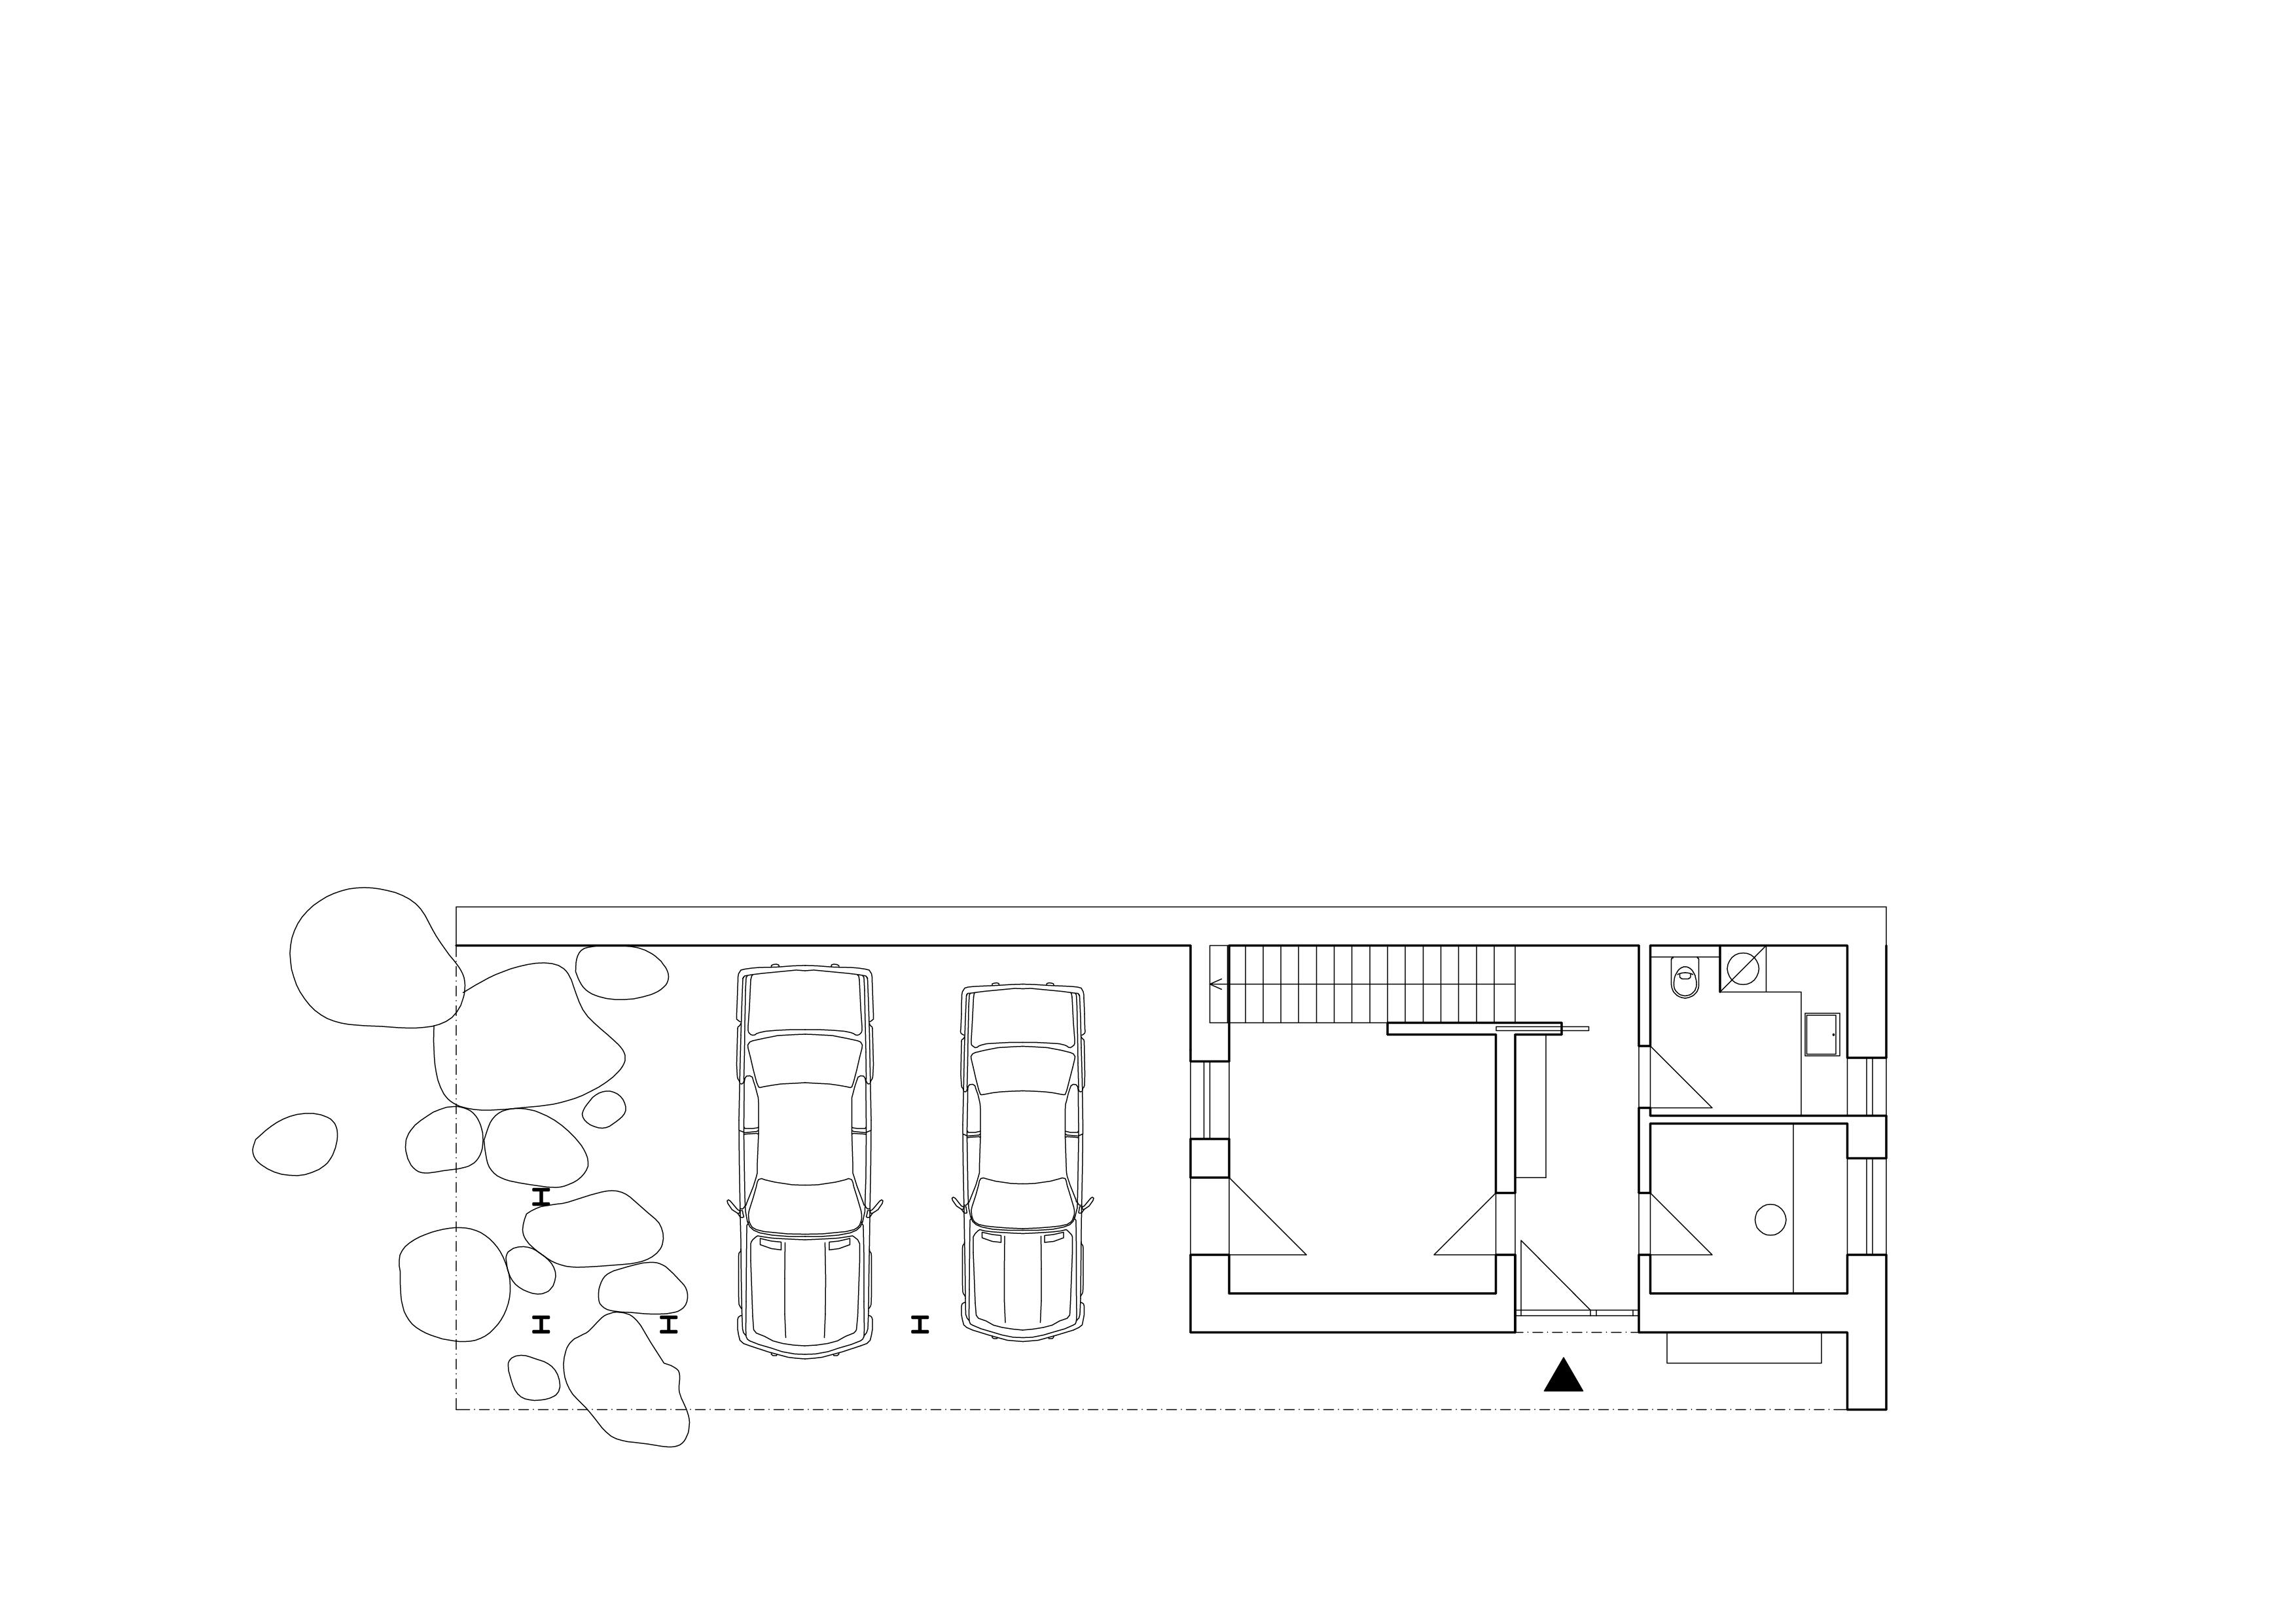 Zavoral Architekt Rodinný dům, Kamenná Horka